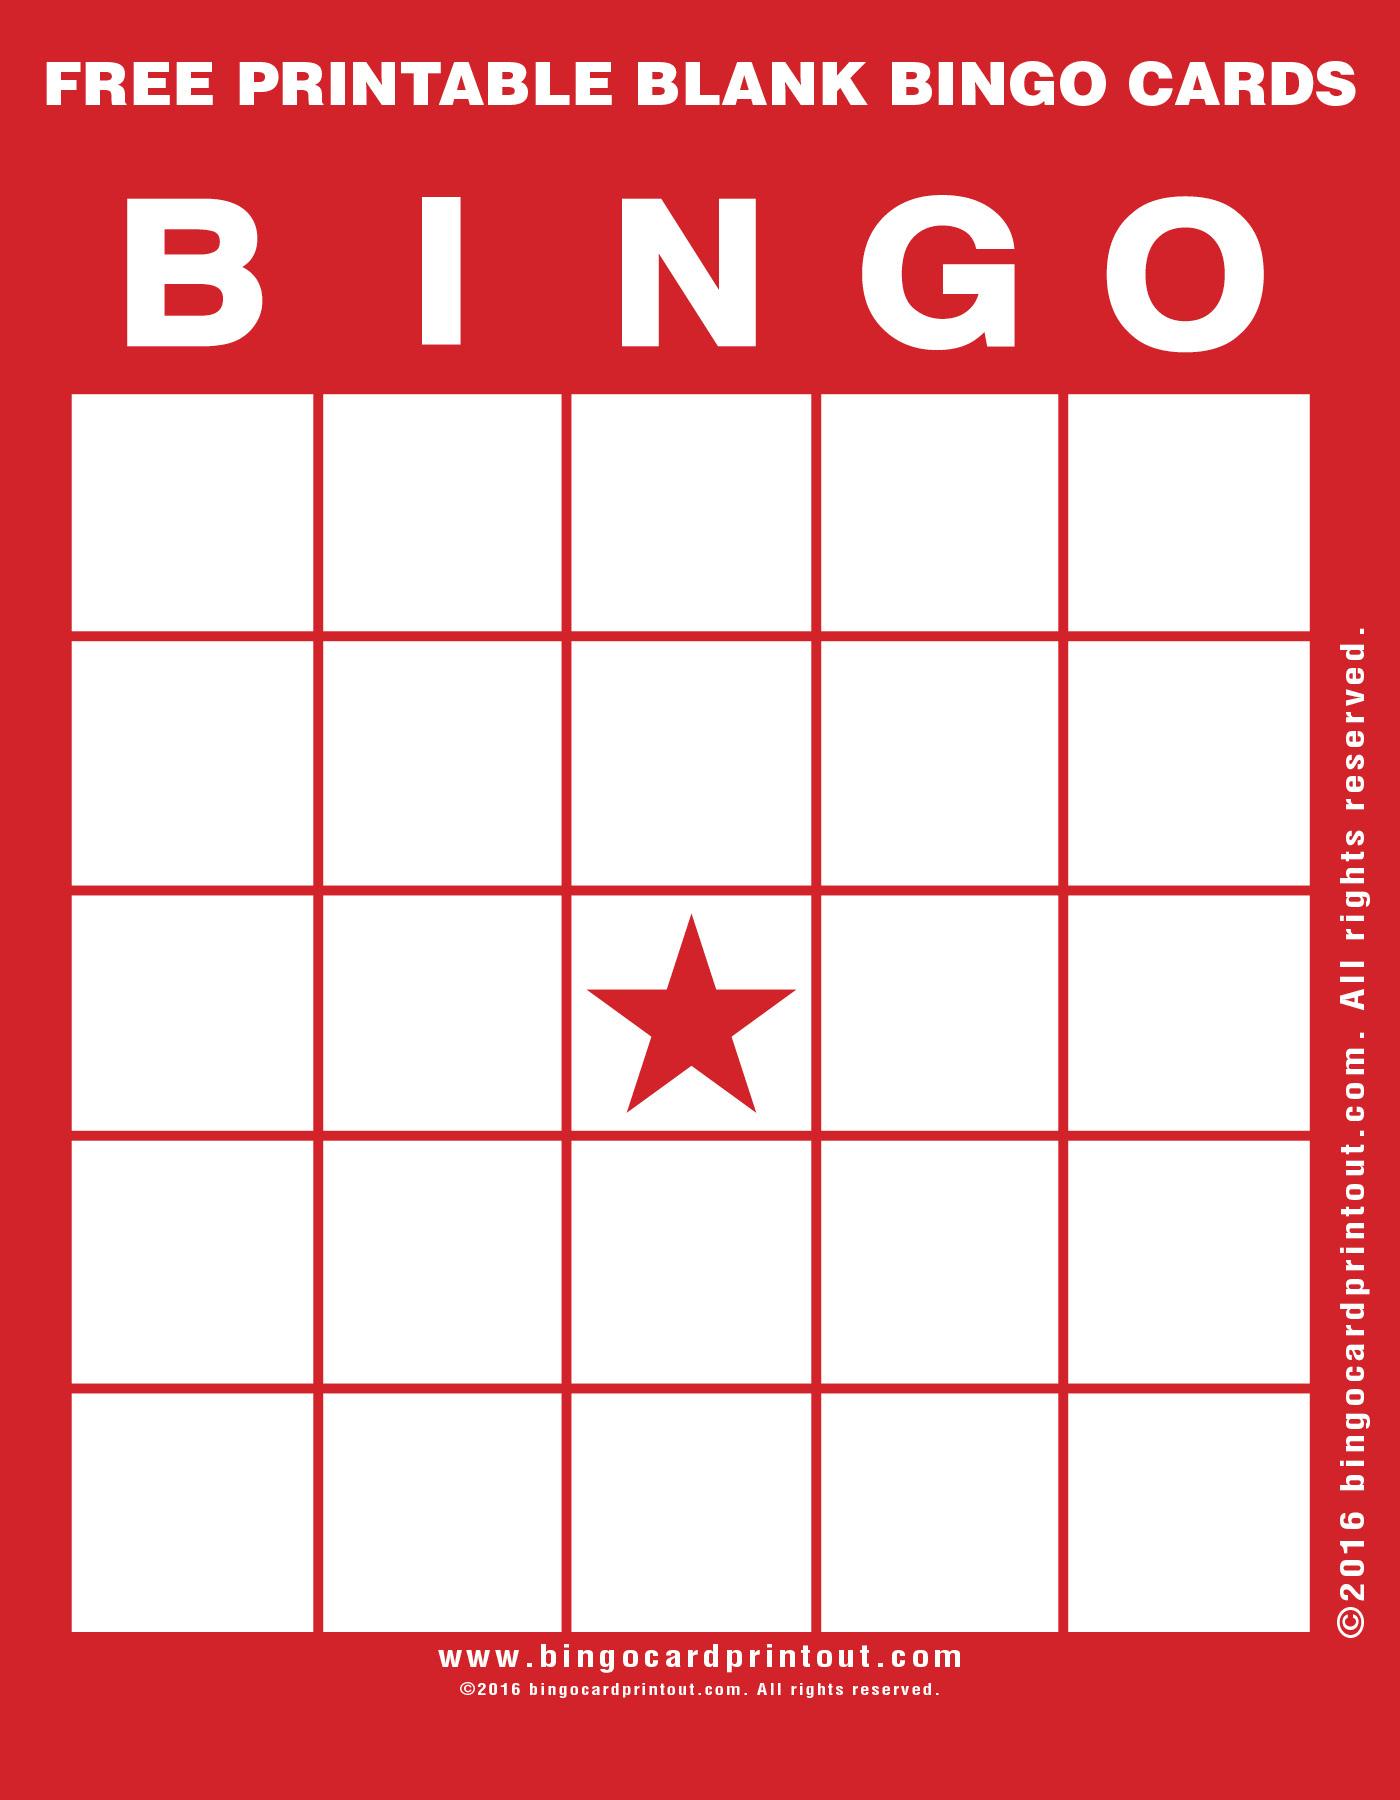 Free Printable Blank Bingo Cards - Bingocardprintout - Free Printable Blank Bingo Cards